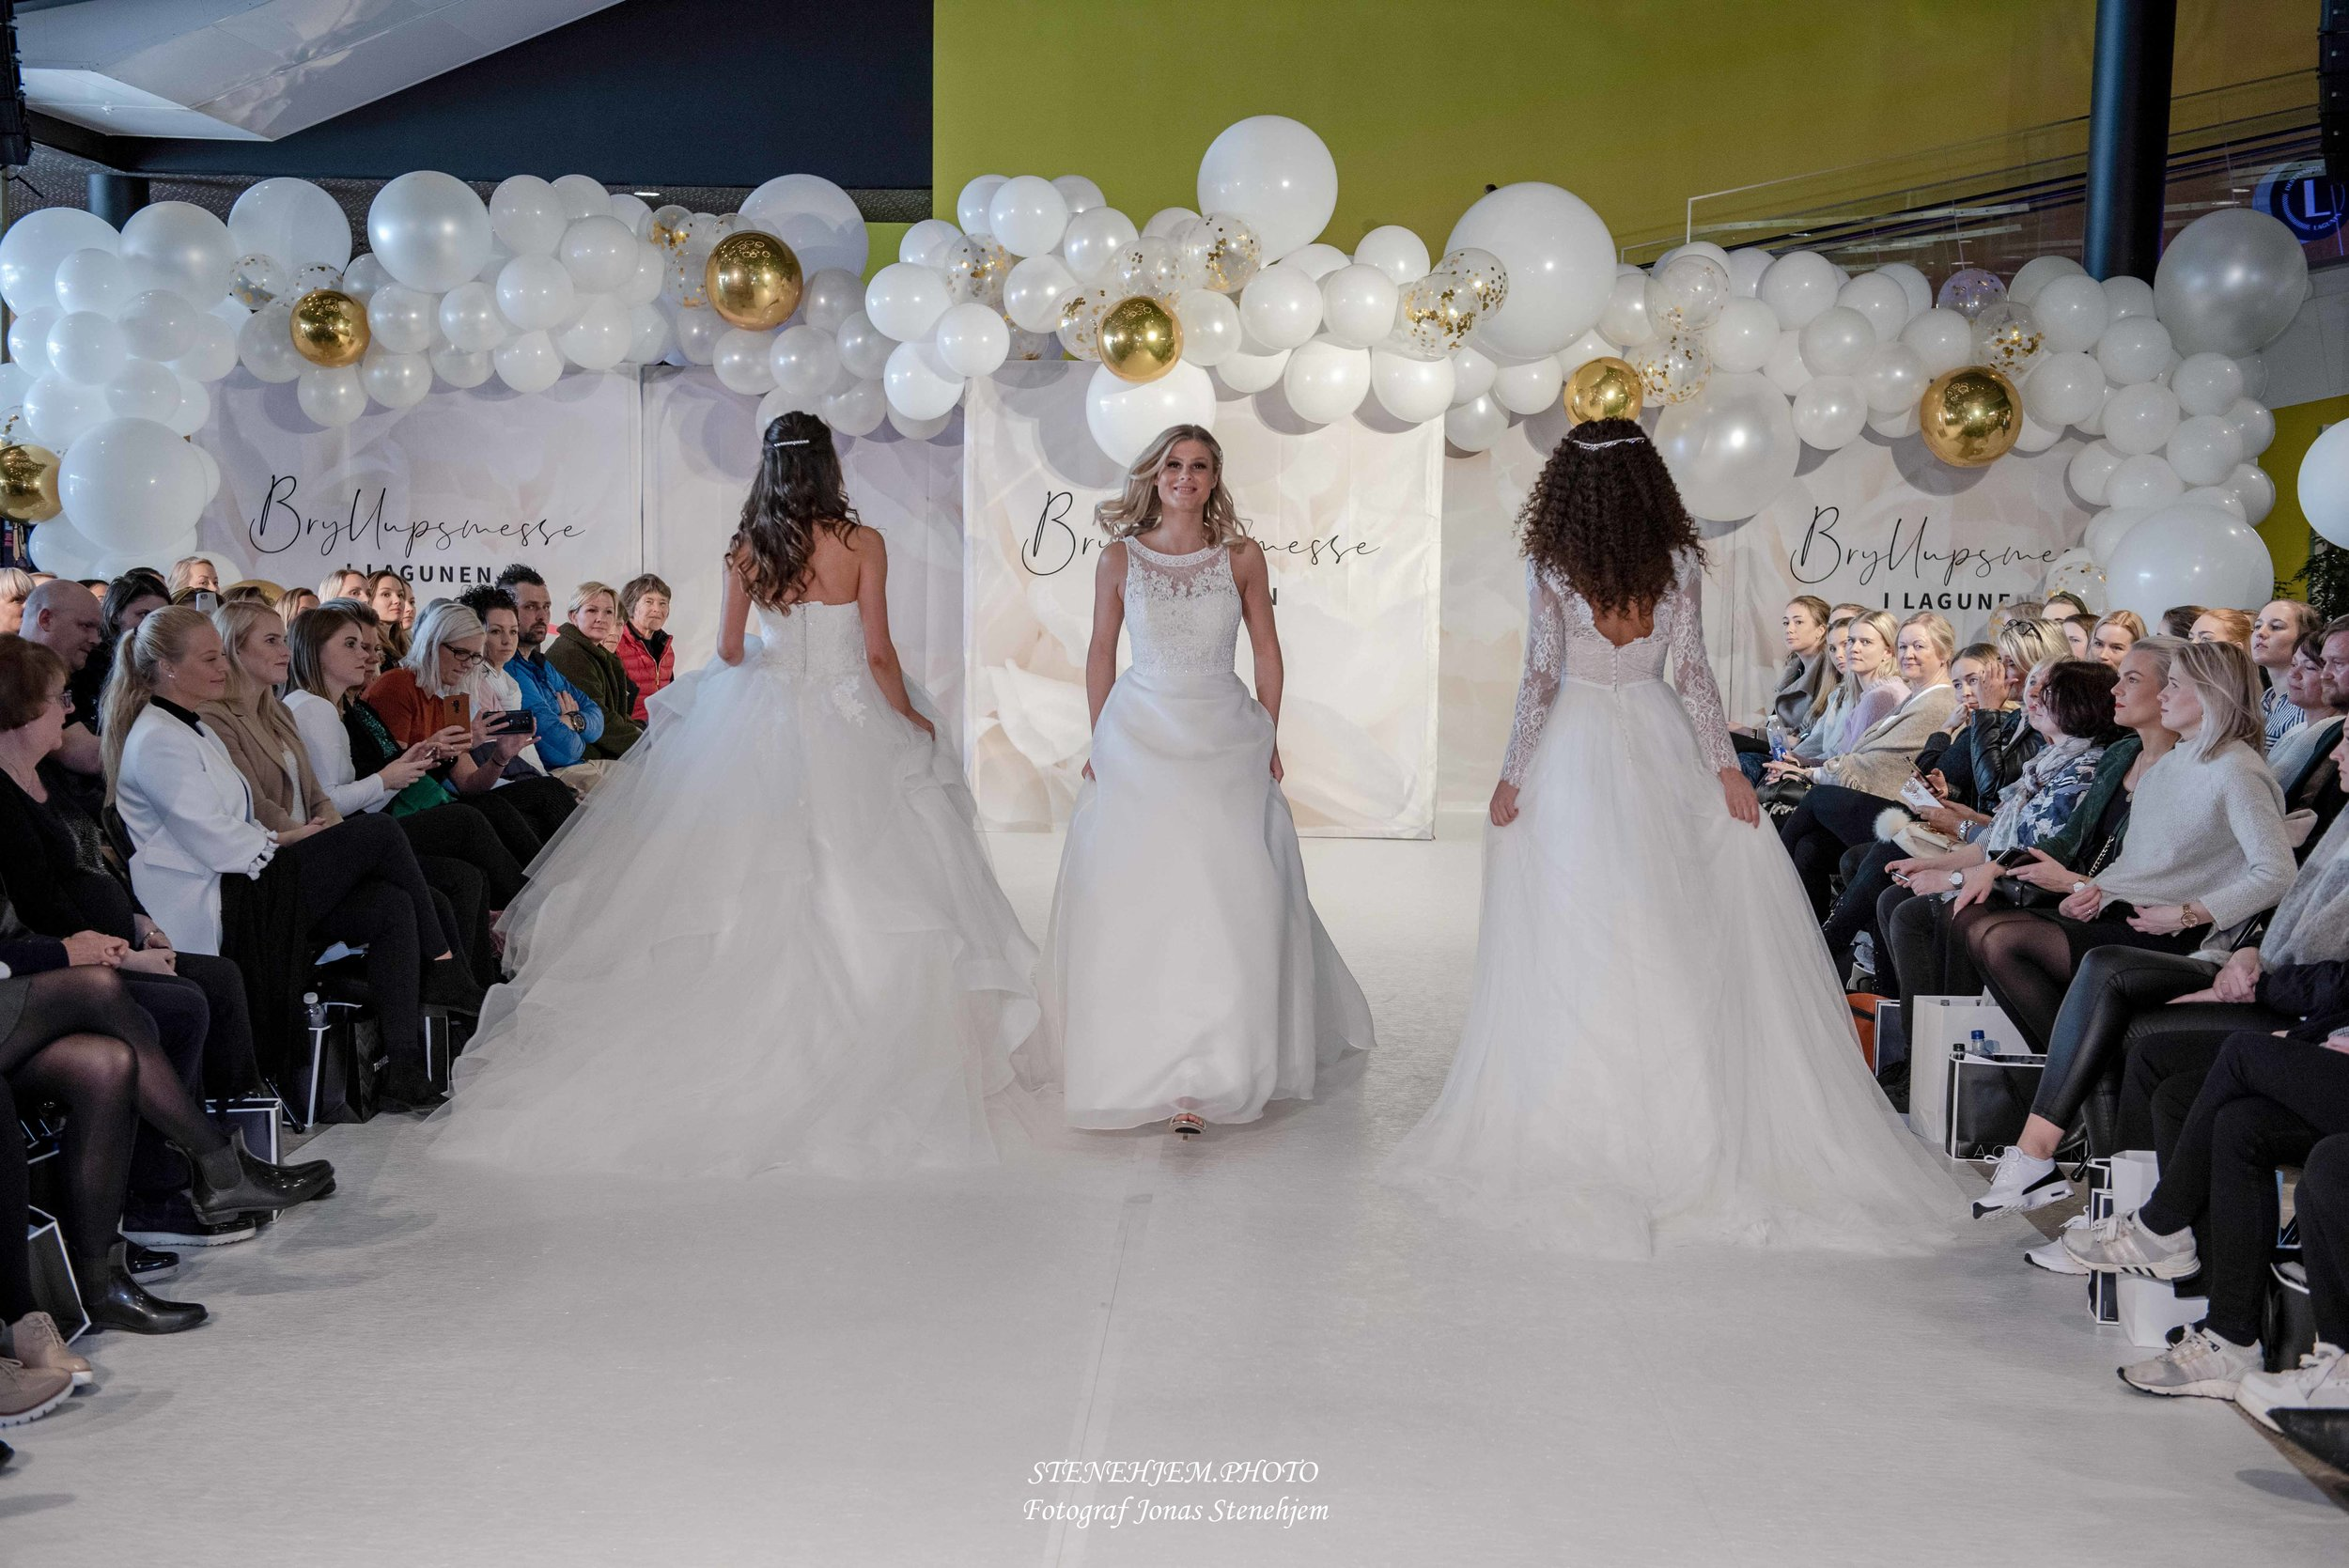 Bryllupsmesse_Lagunen_mittaltweddingfair__092.jpg